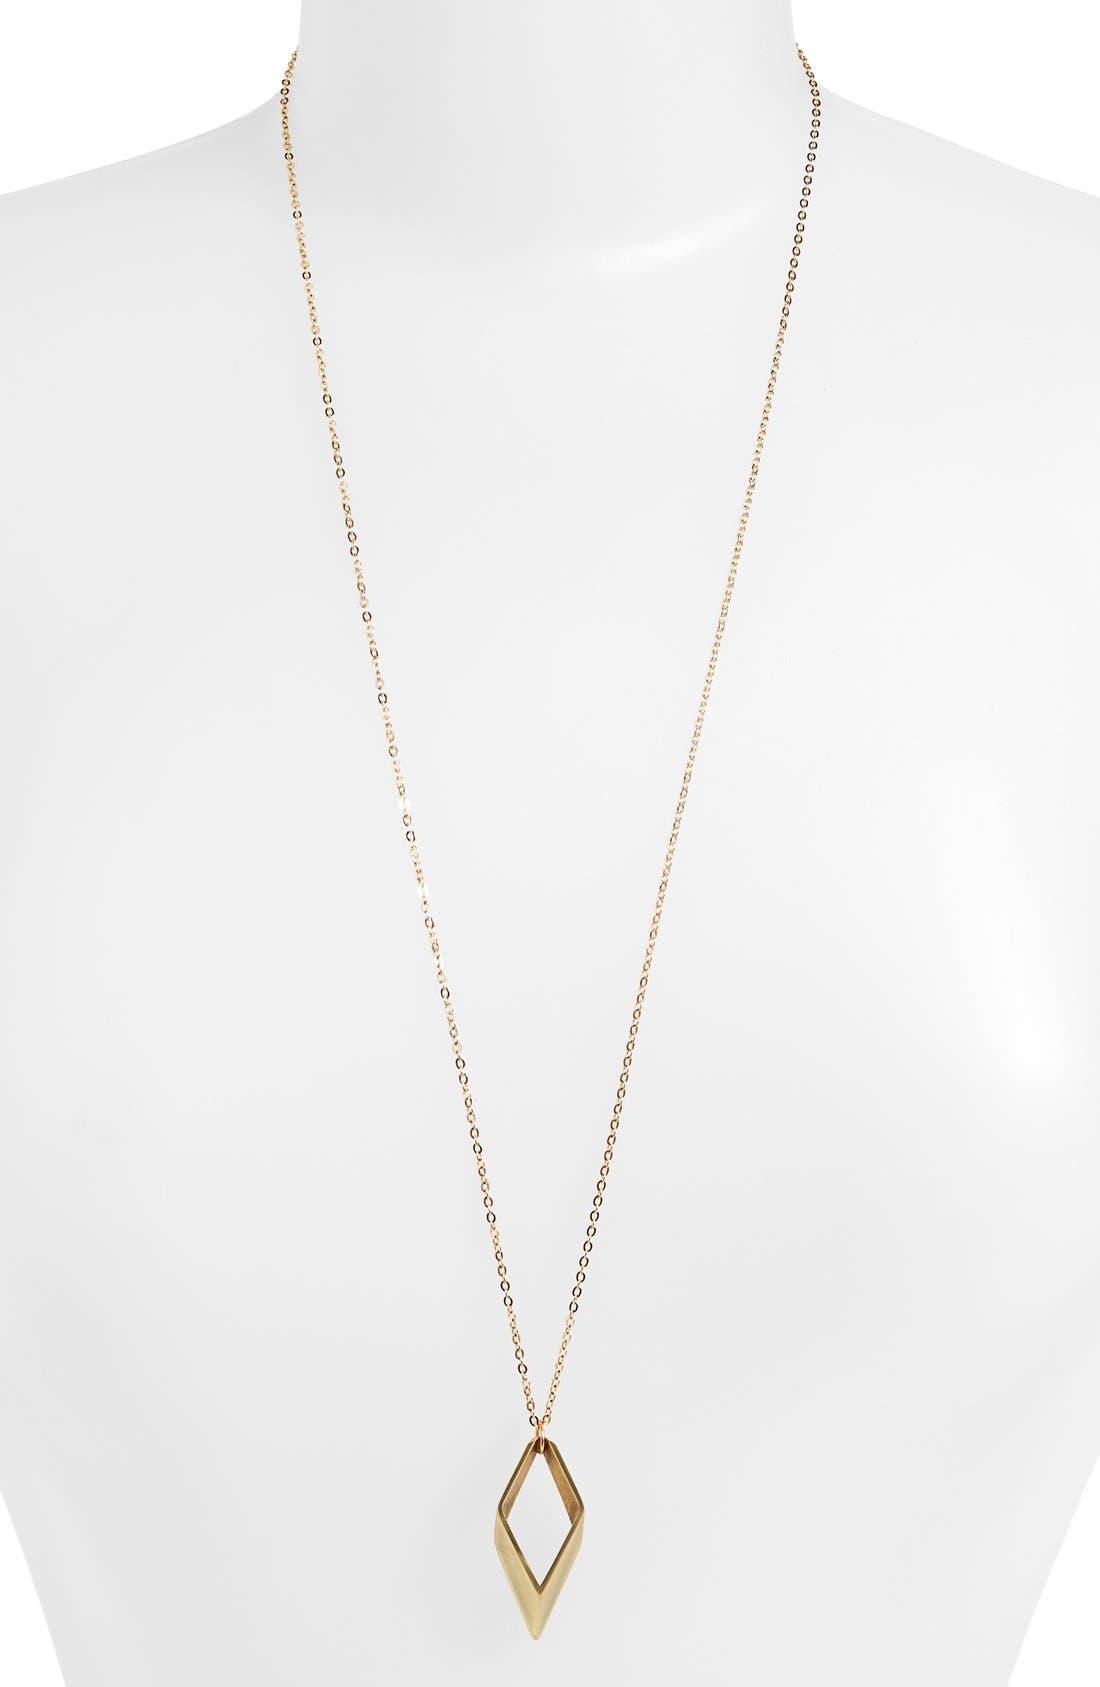 Alternate Image 1 Selected - Baleen 'Parallelogram' Pendant Necklace